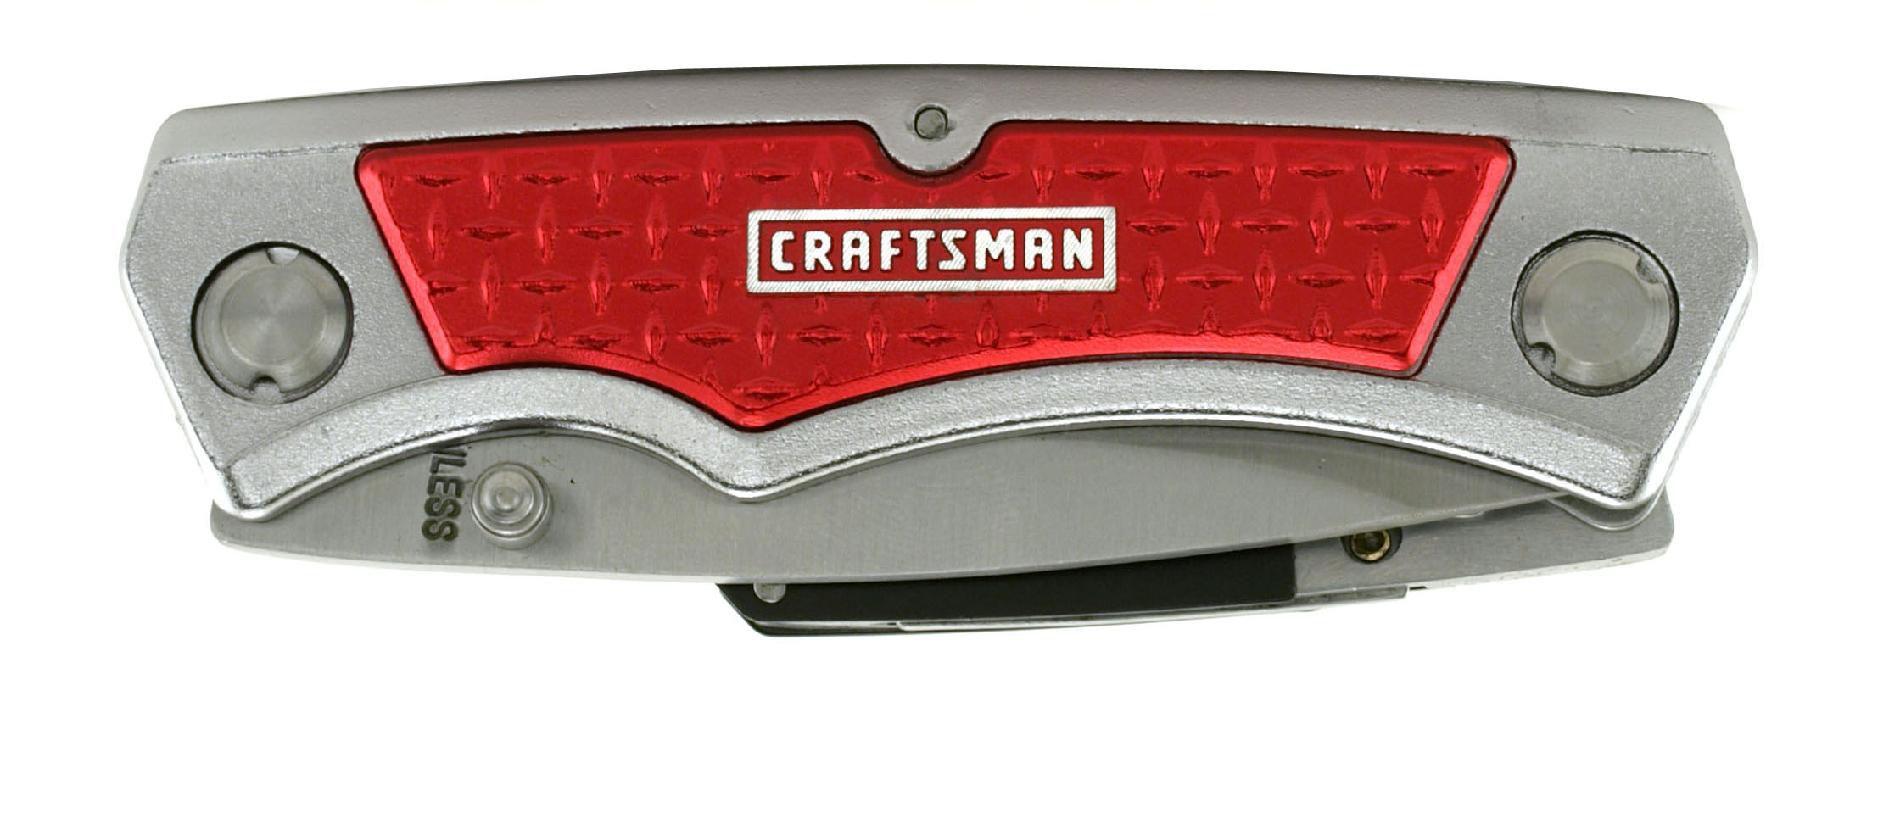 Craftsman Twin-Blade Lockback Folding Knife